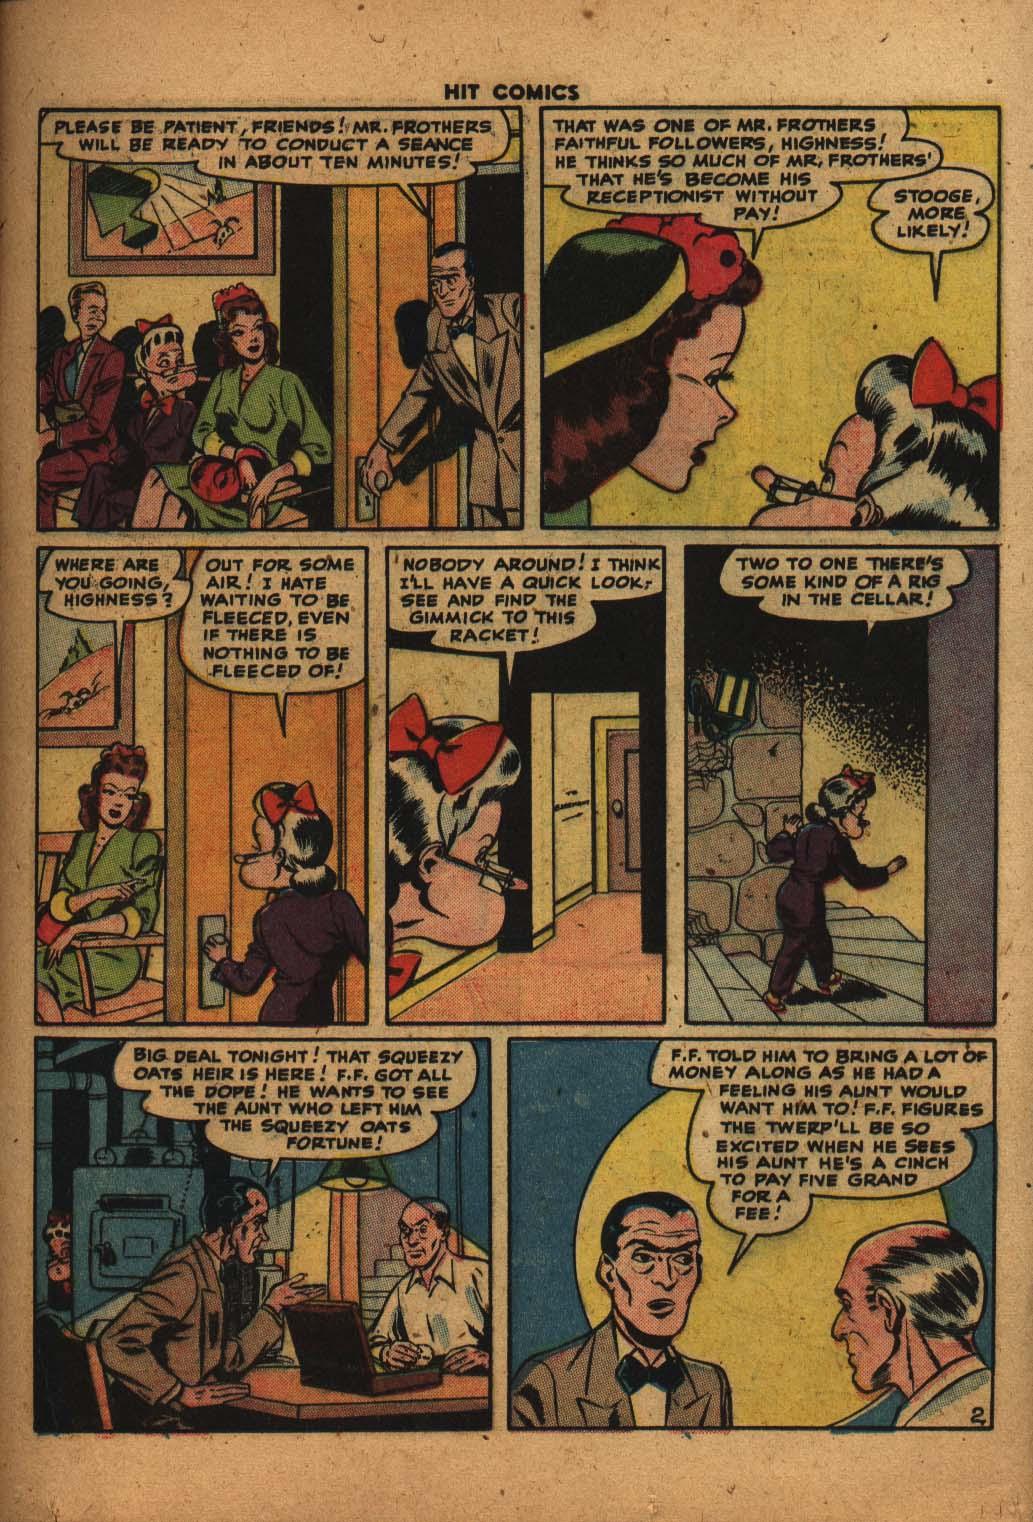 Read online Hit Comics comic -  Issue #47 - 16